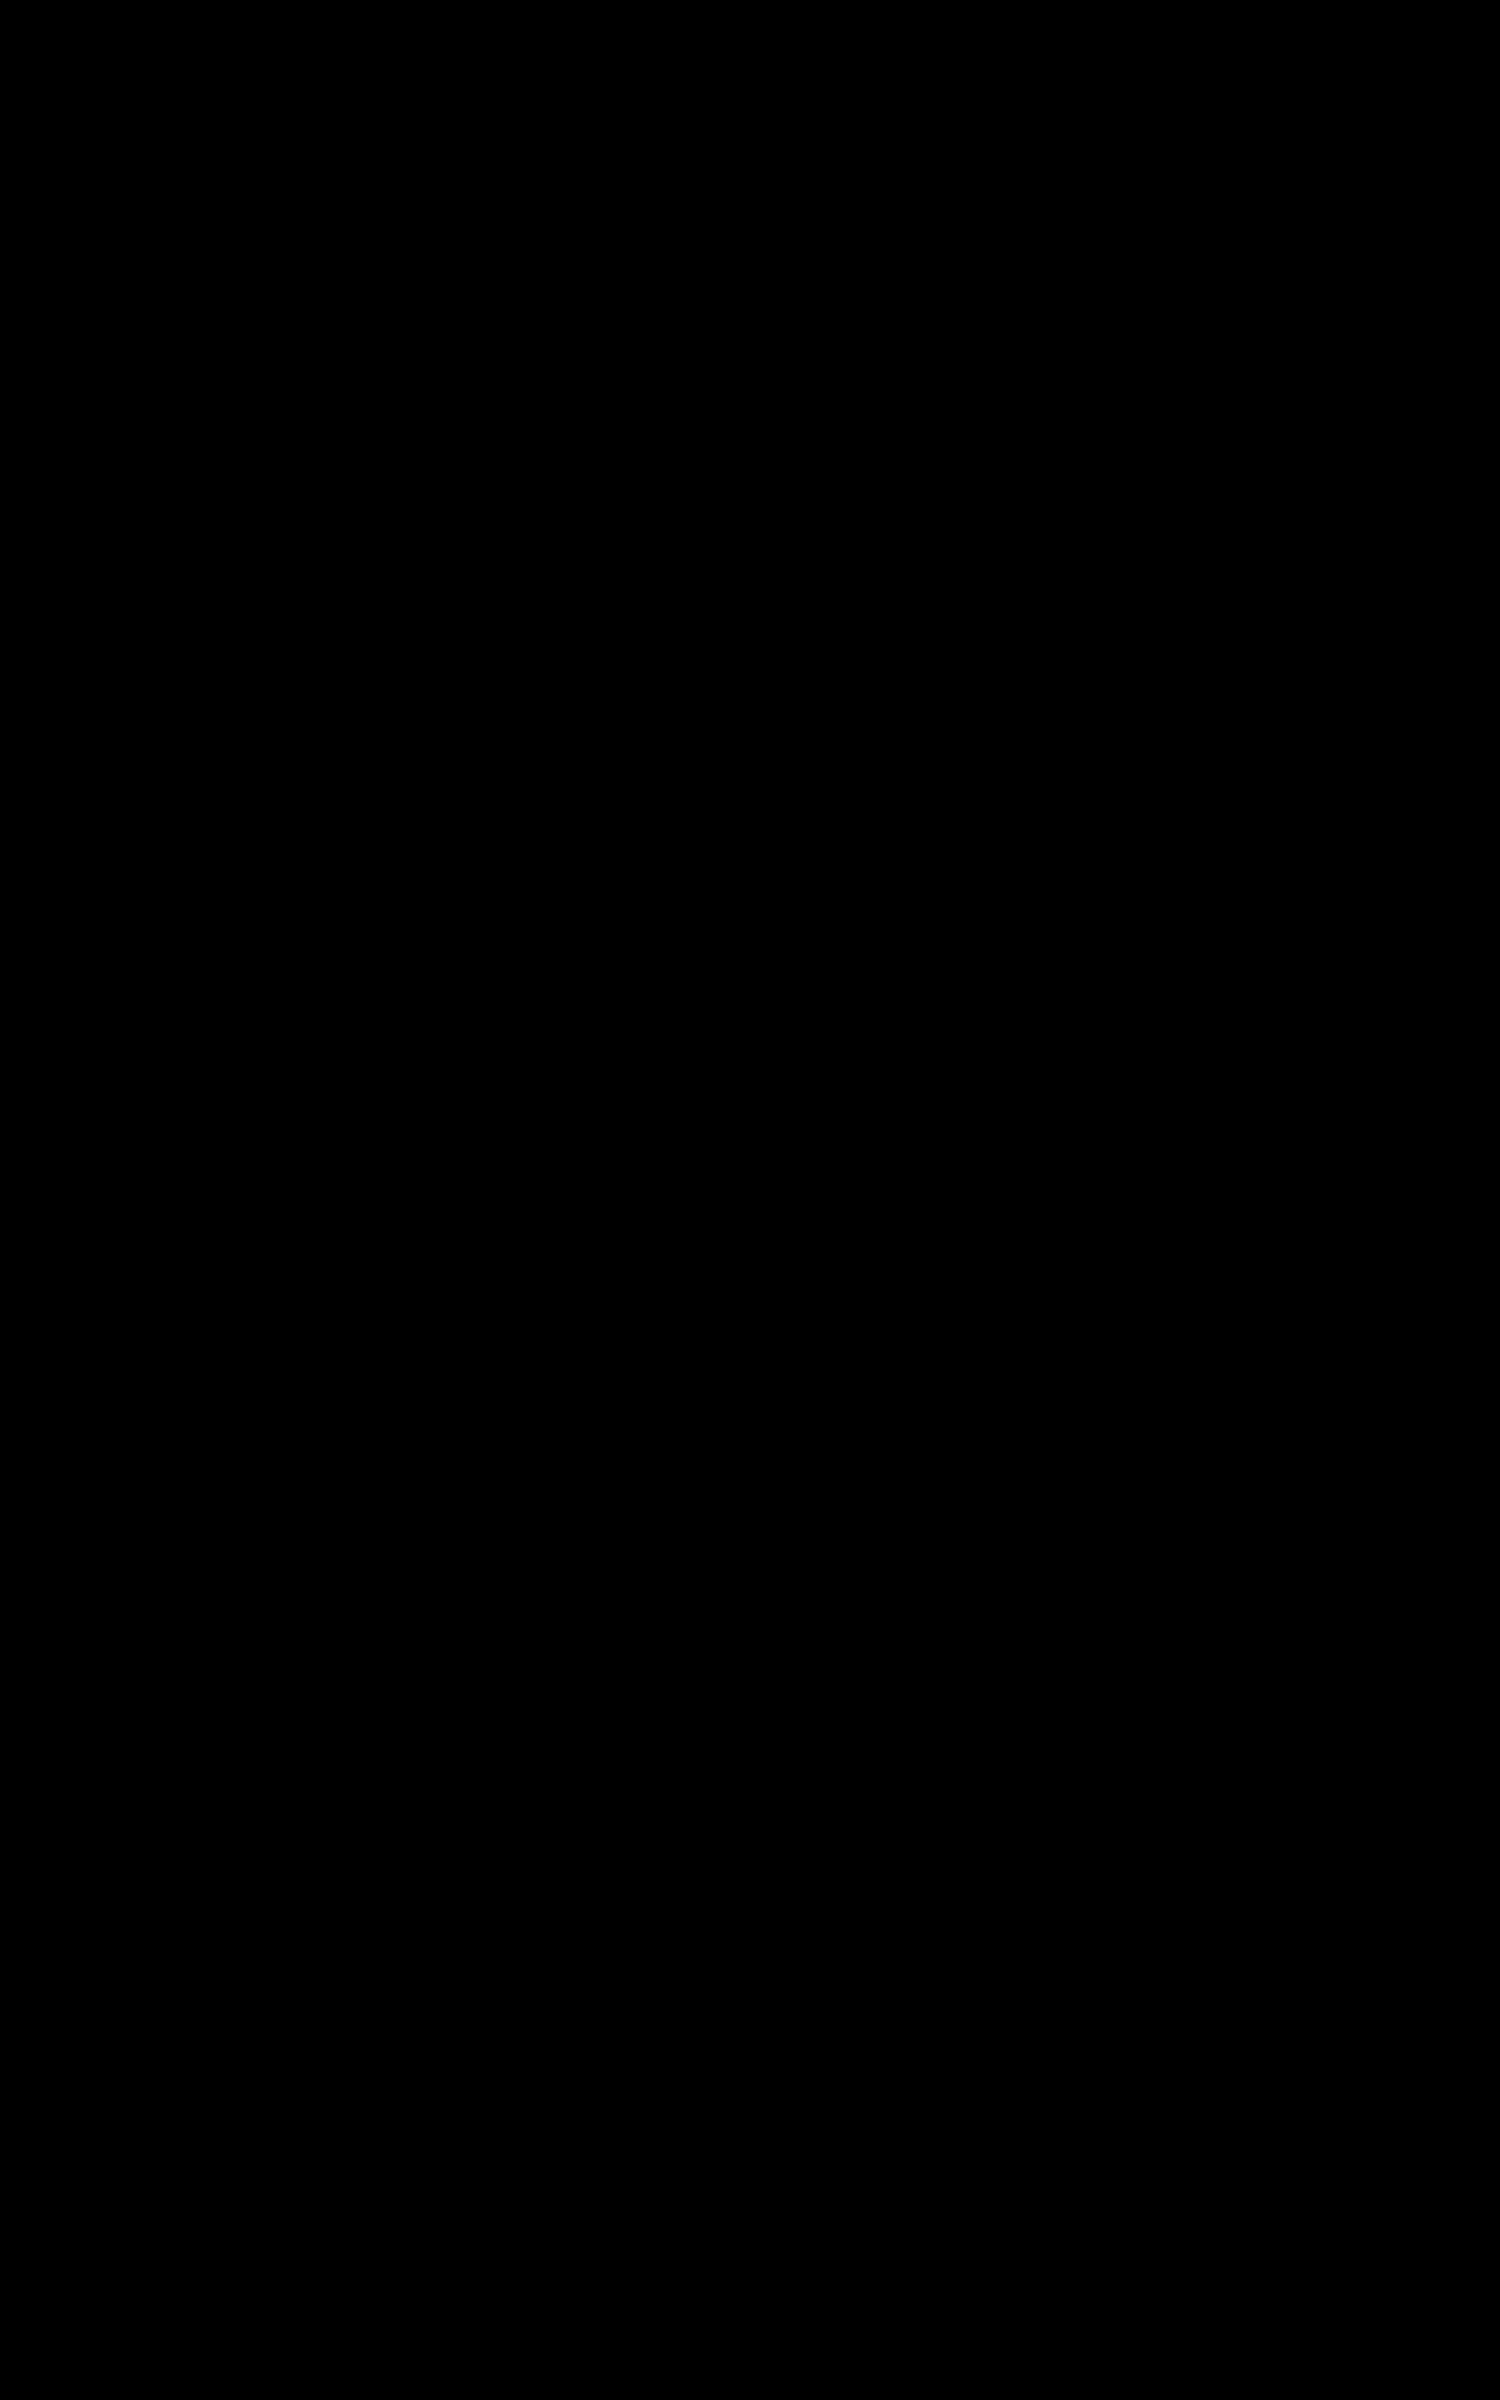 Cfl Light Bulb Clip Art | Clipart Panda - Free Clipart Images for Black Light Bulb Clip Art  75tgx